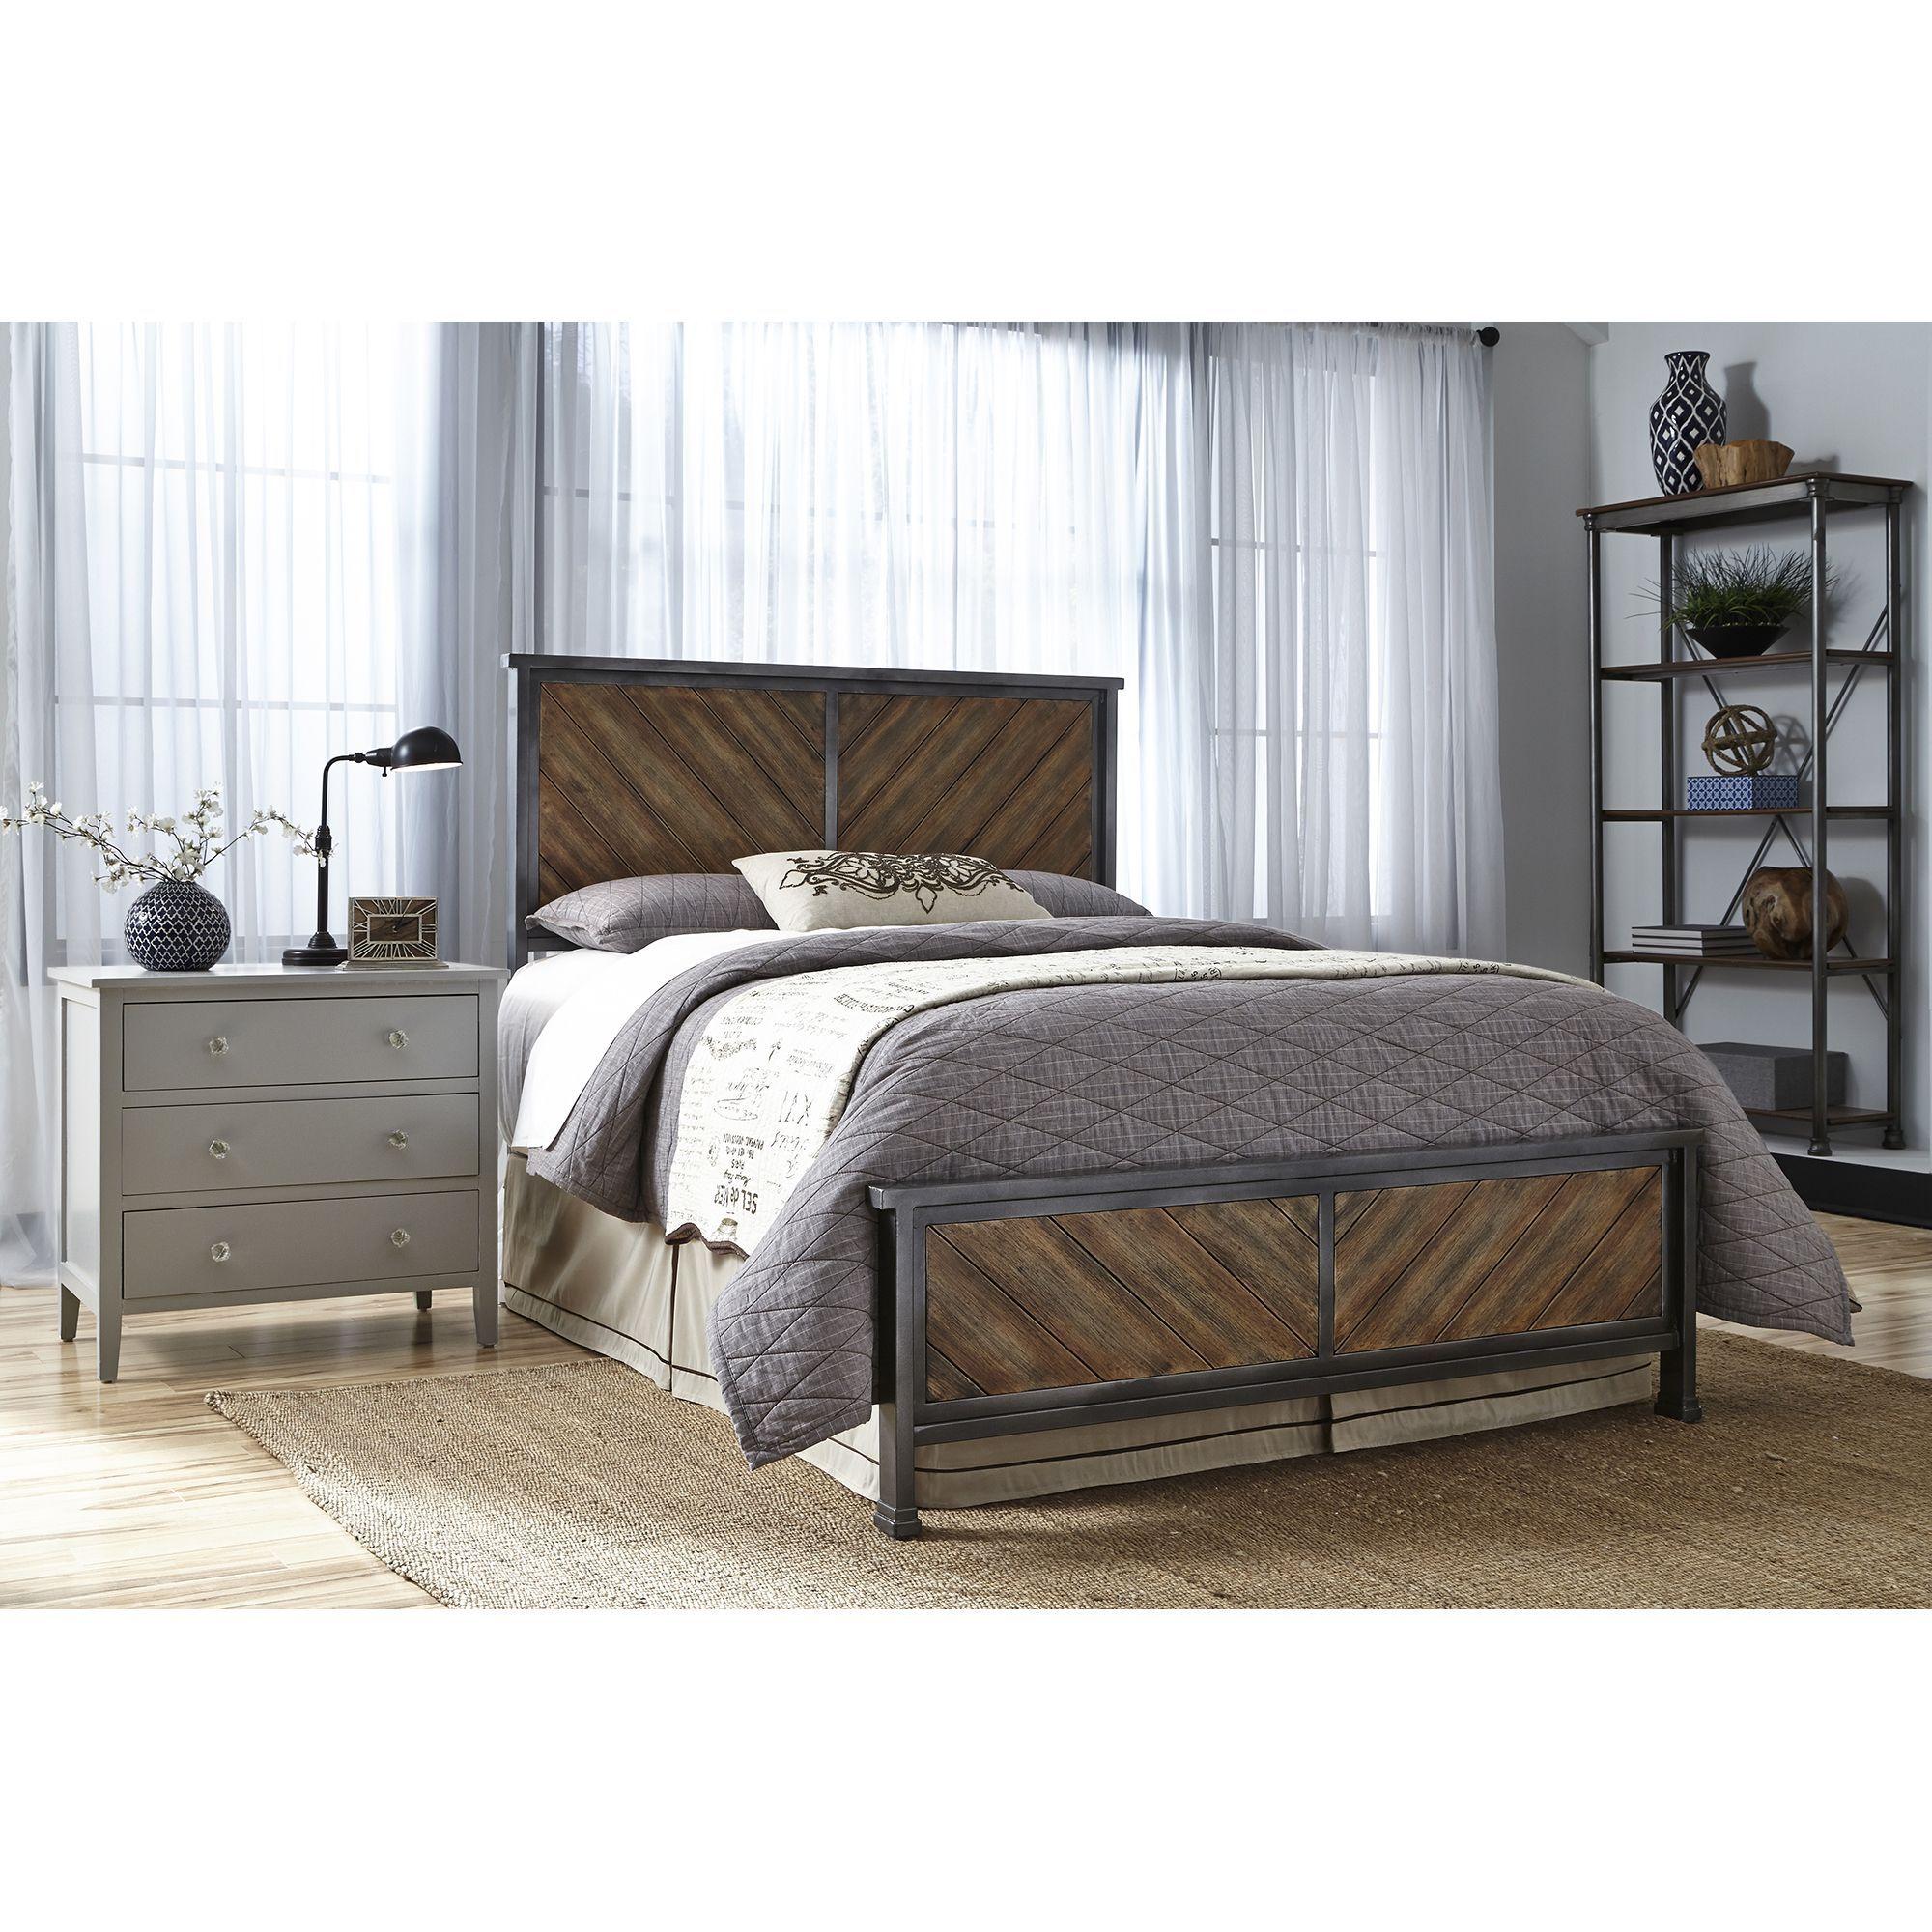 Leggett Platt Braden Complete Bed With Metal Panels And